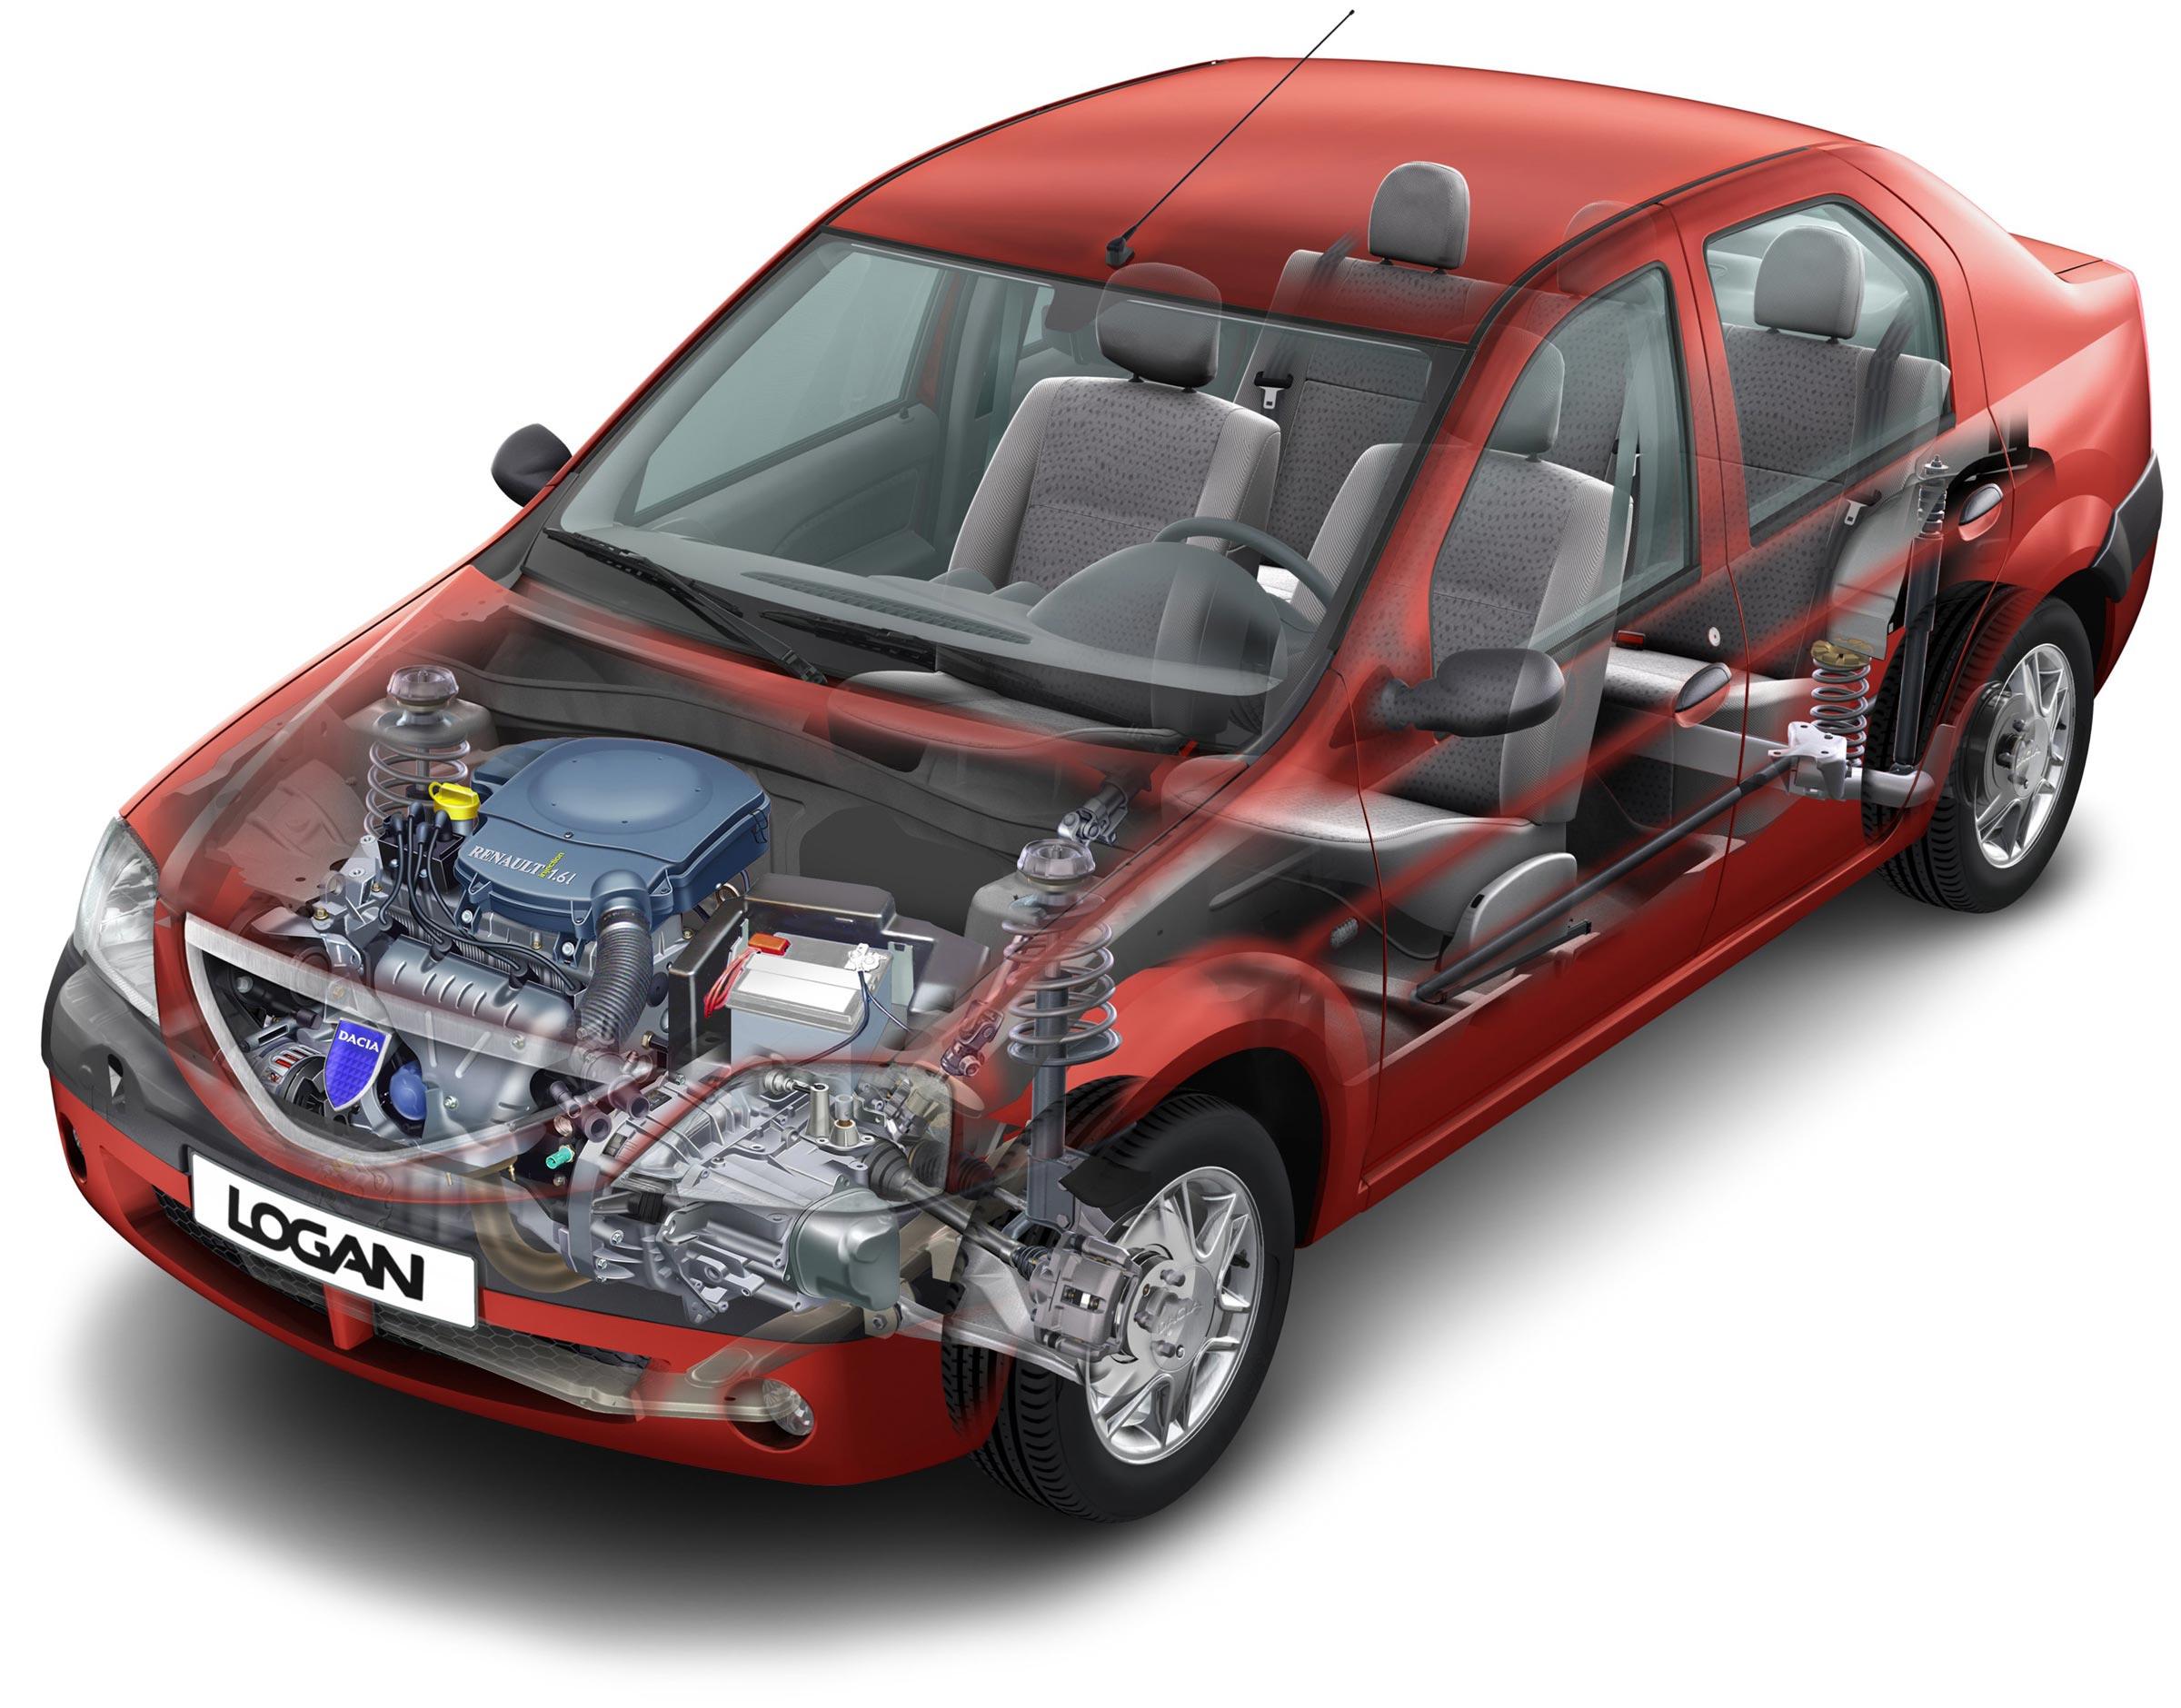 Dacia Logan cutaway drawing